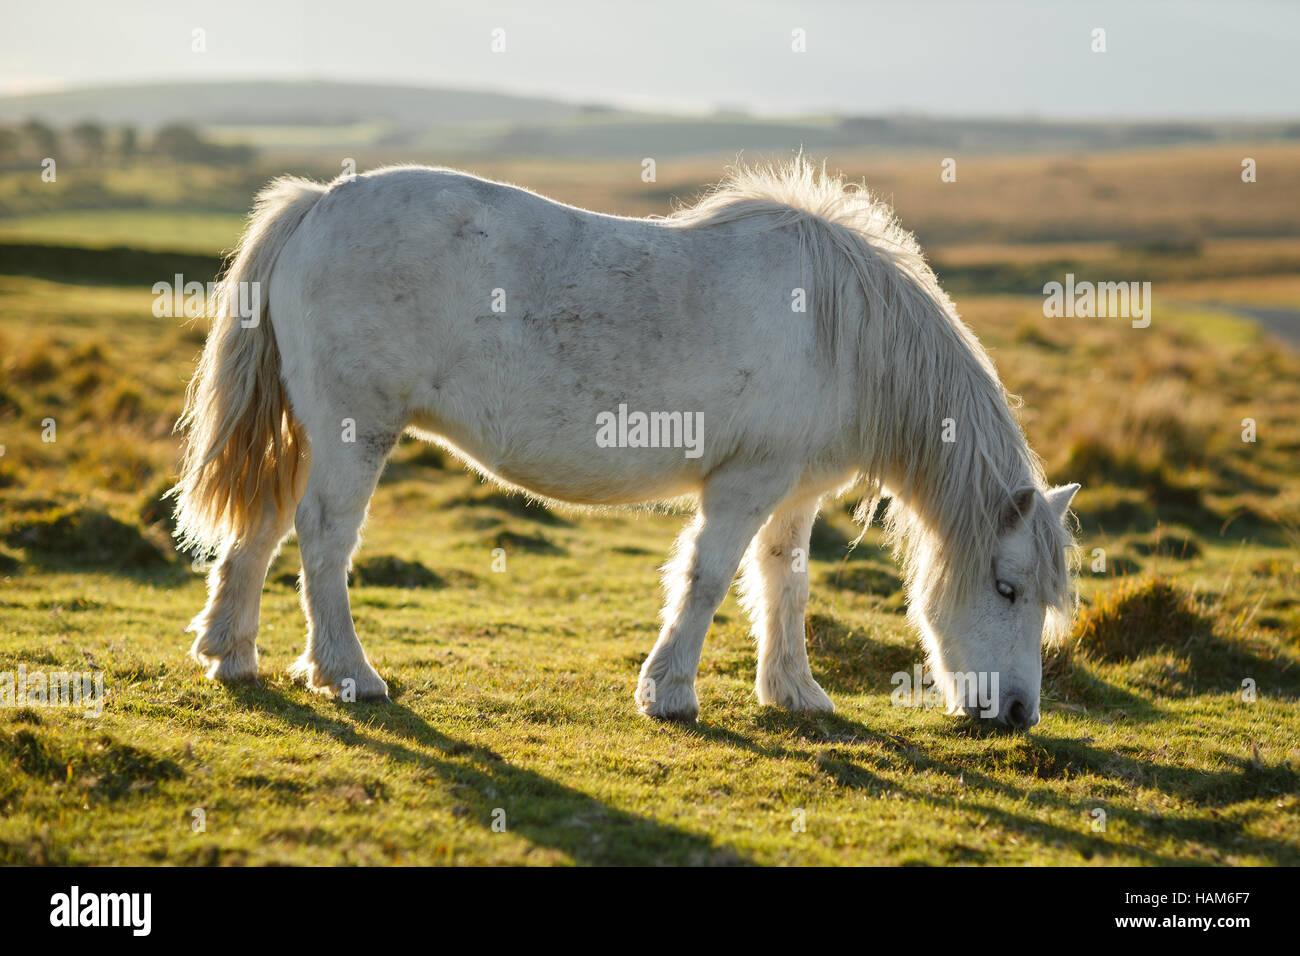 Dartmoor pony in a grassy field Stock Photo